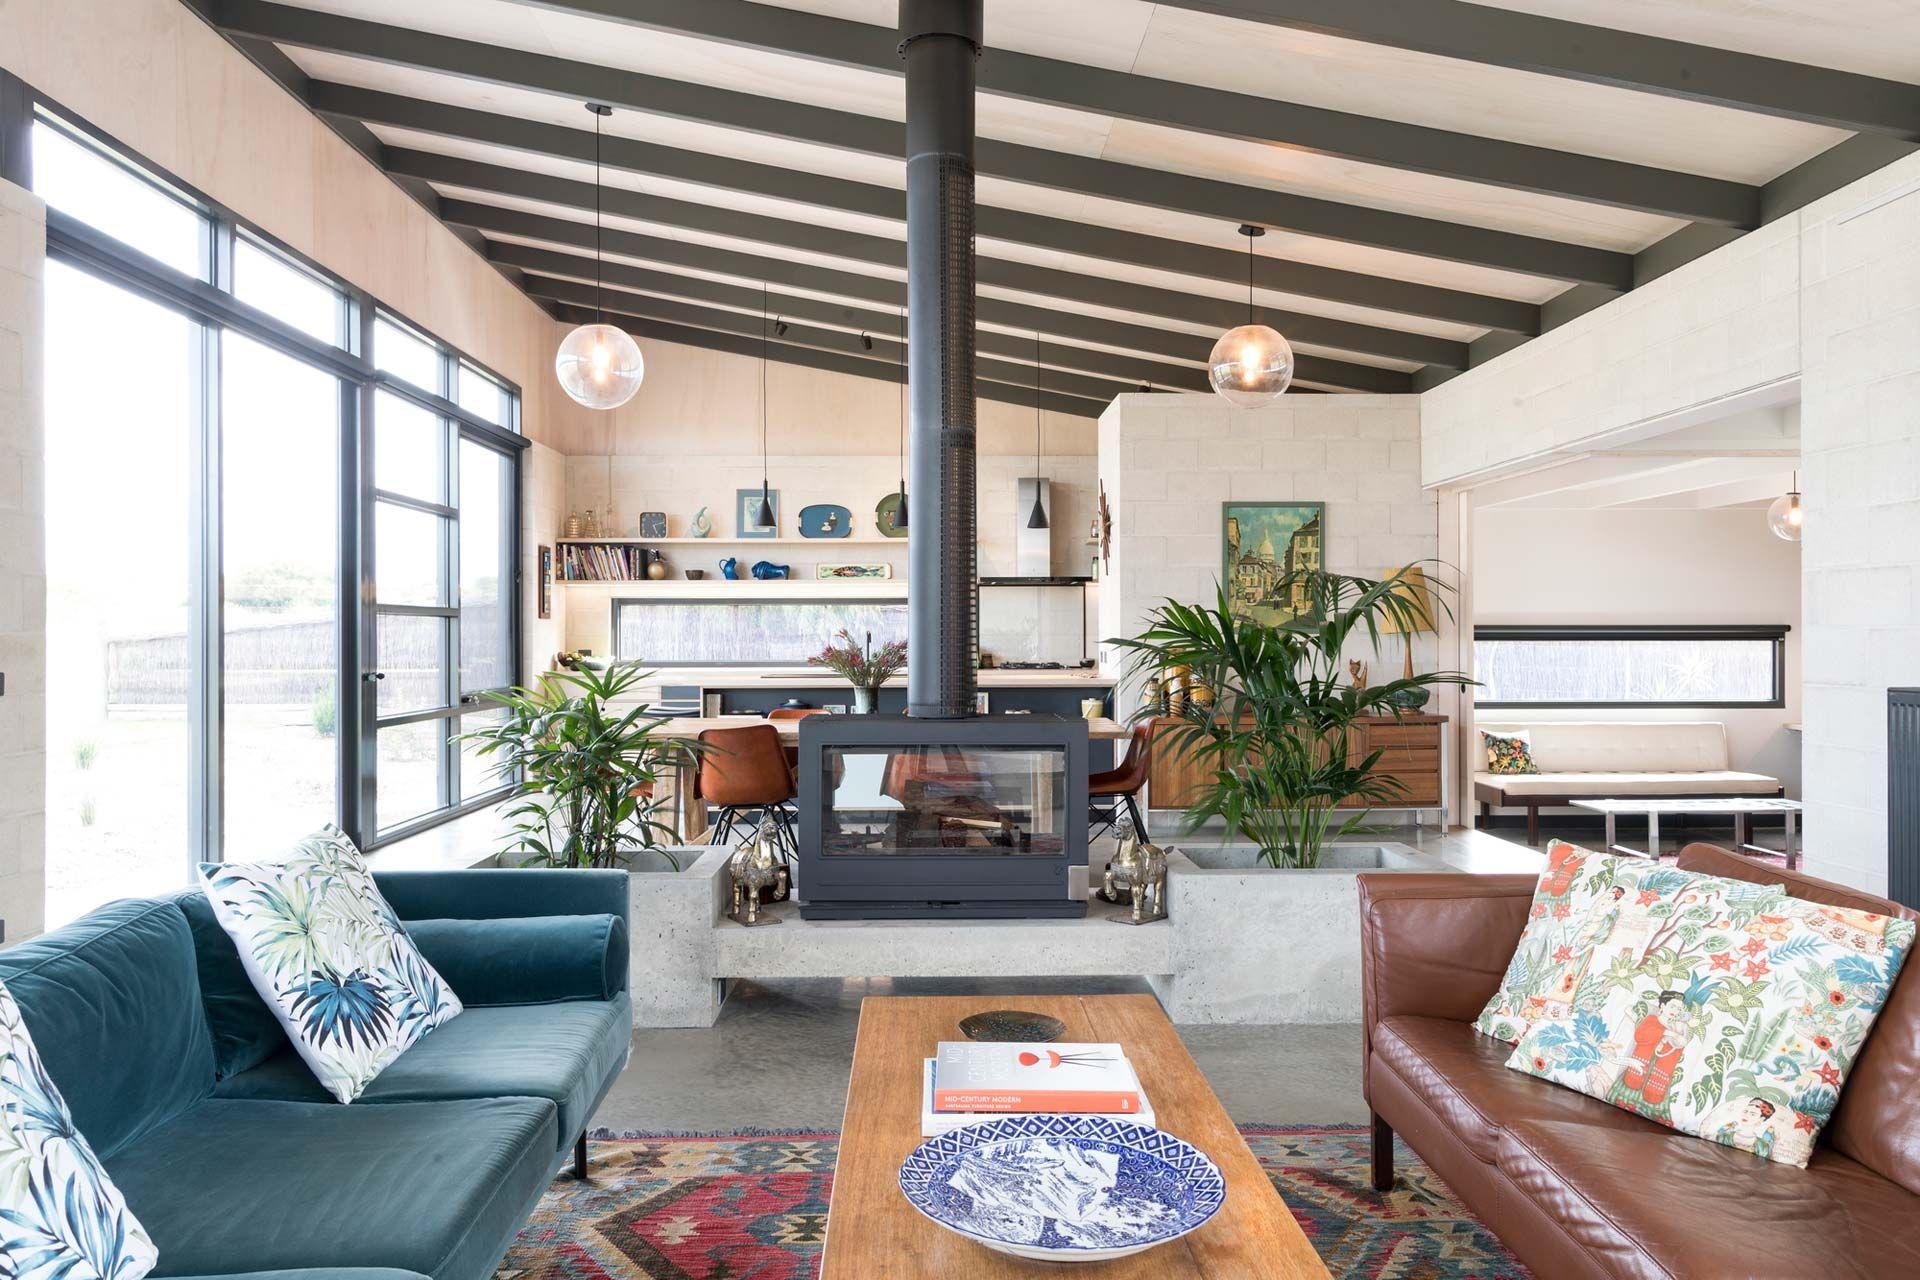 Golf Course House Interior Design Courses Mid Century Modern House Home